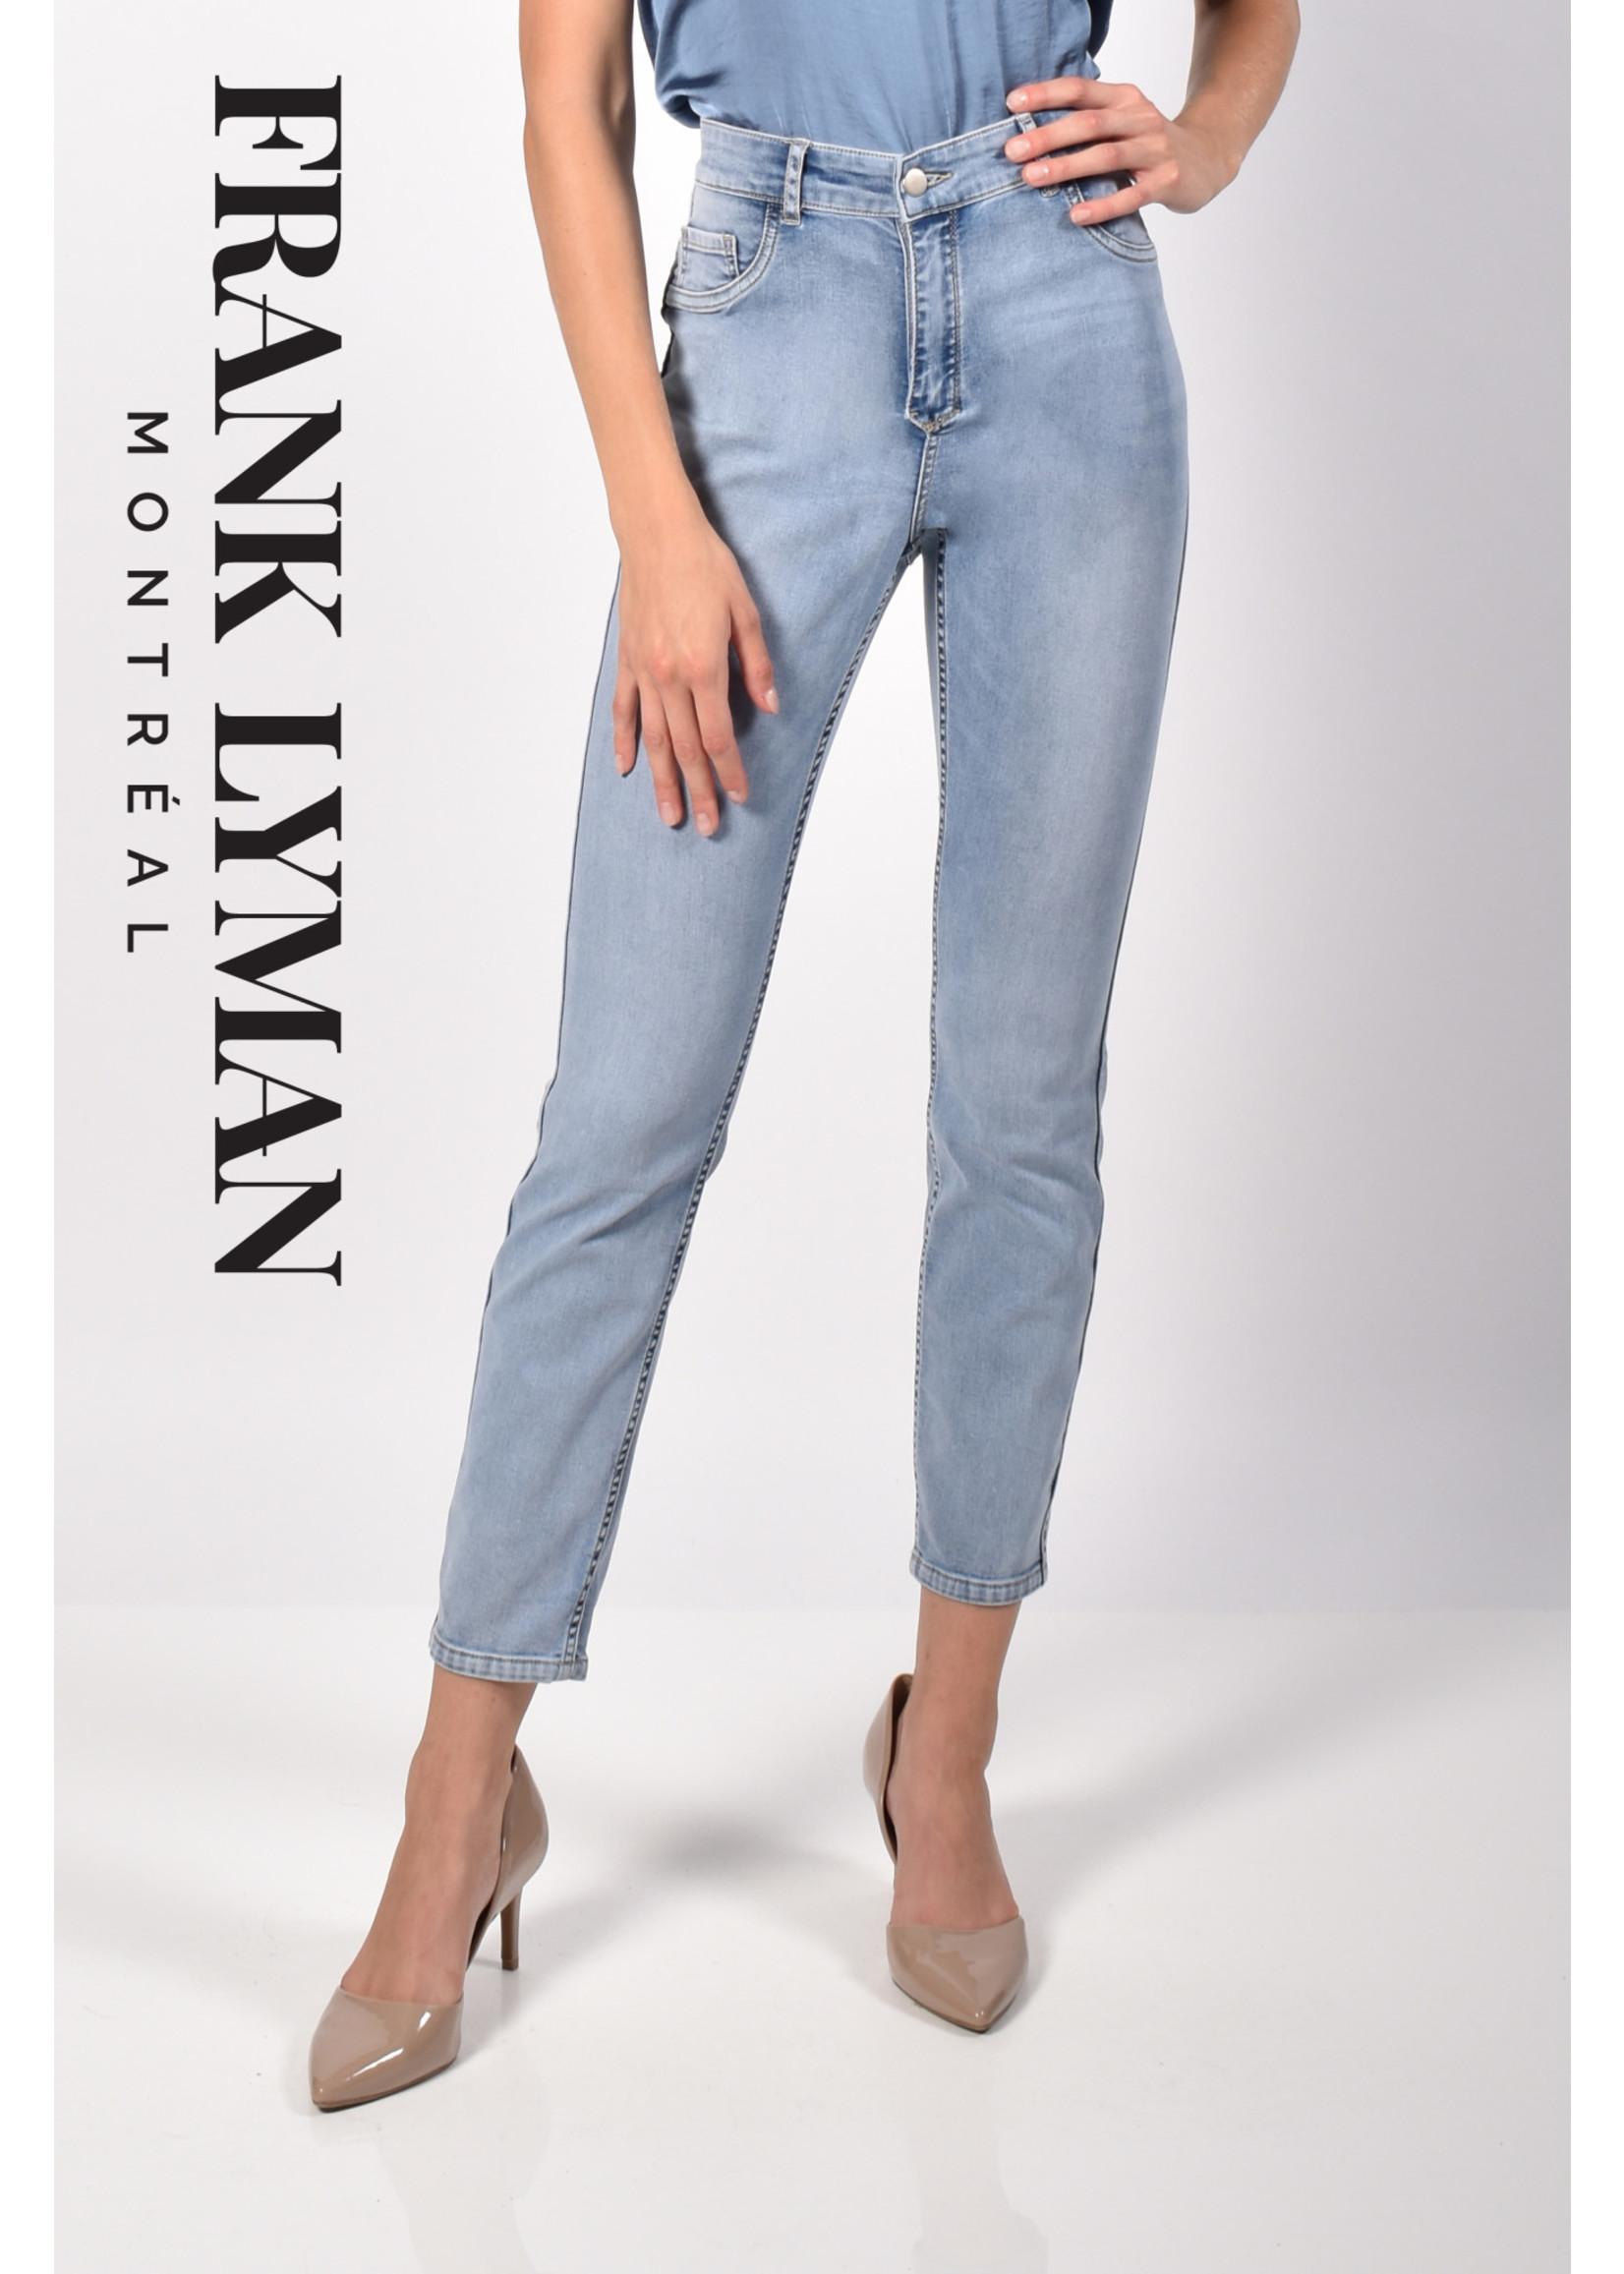 Frank Lyman Dark Blue/Floral Denim Reverisble Pant